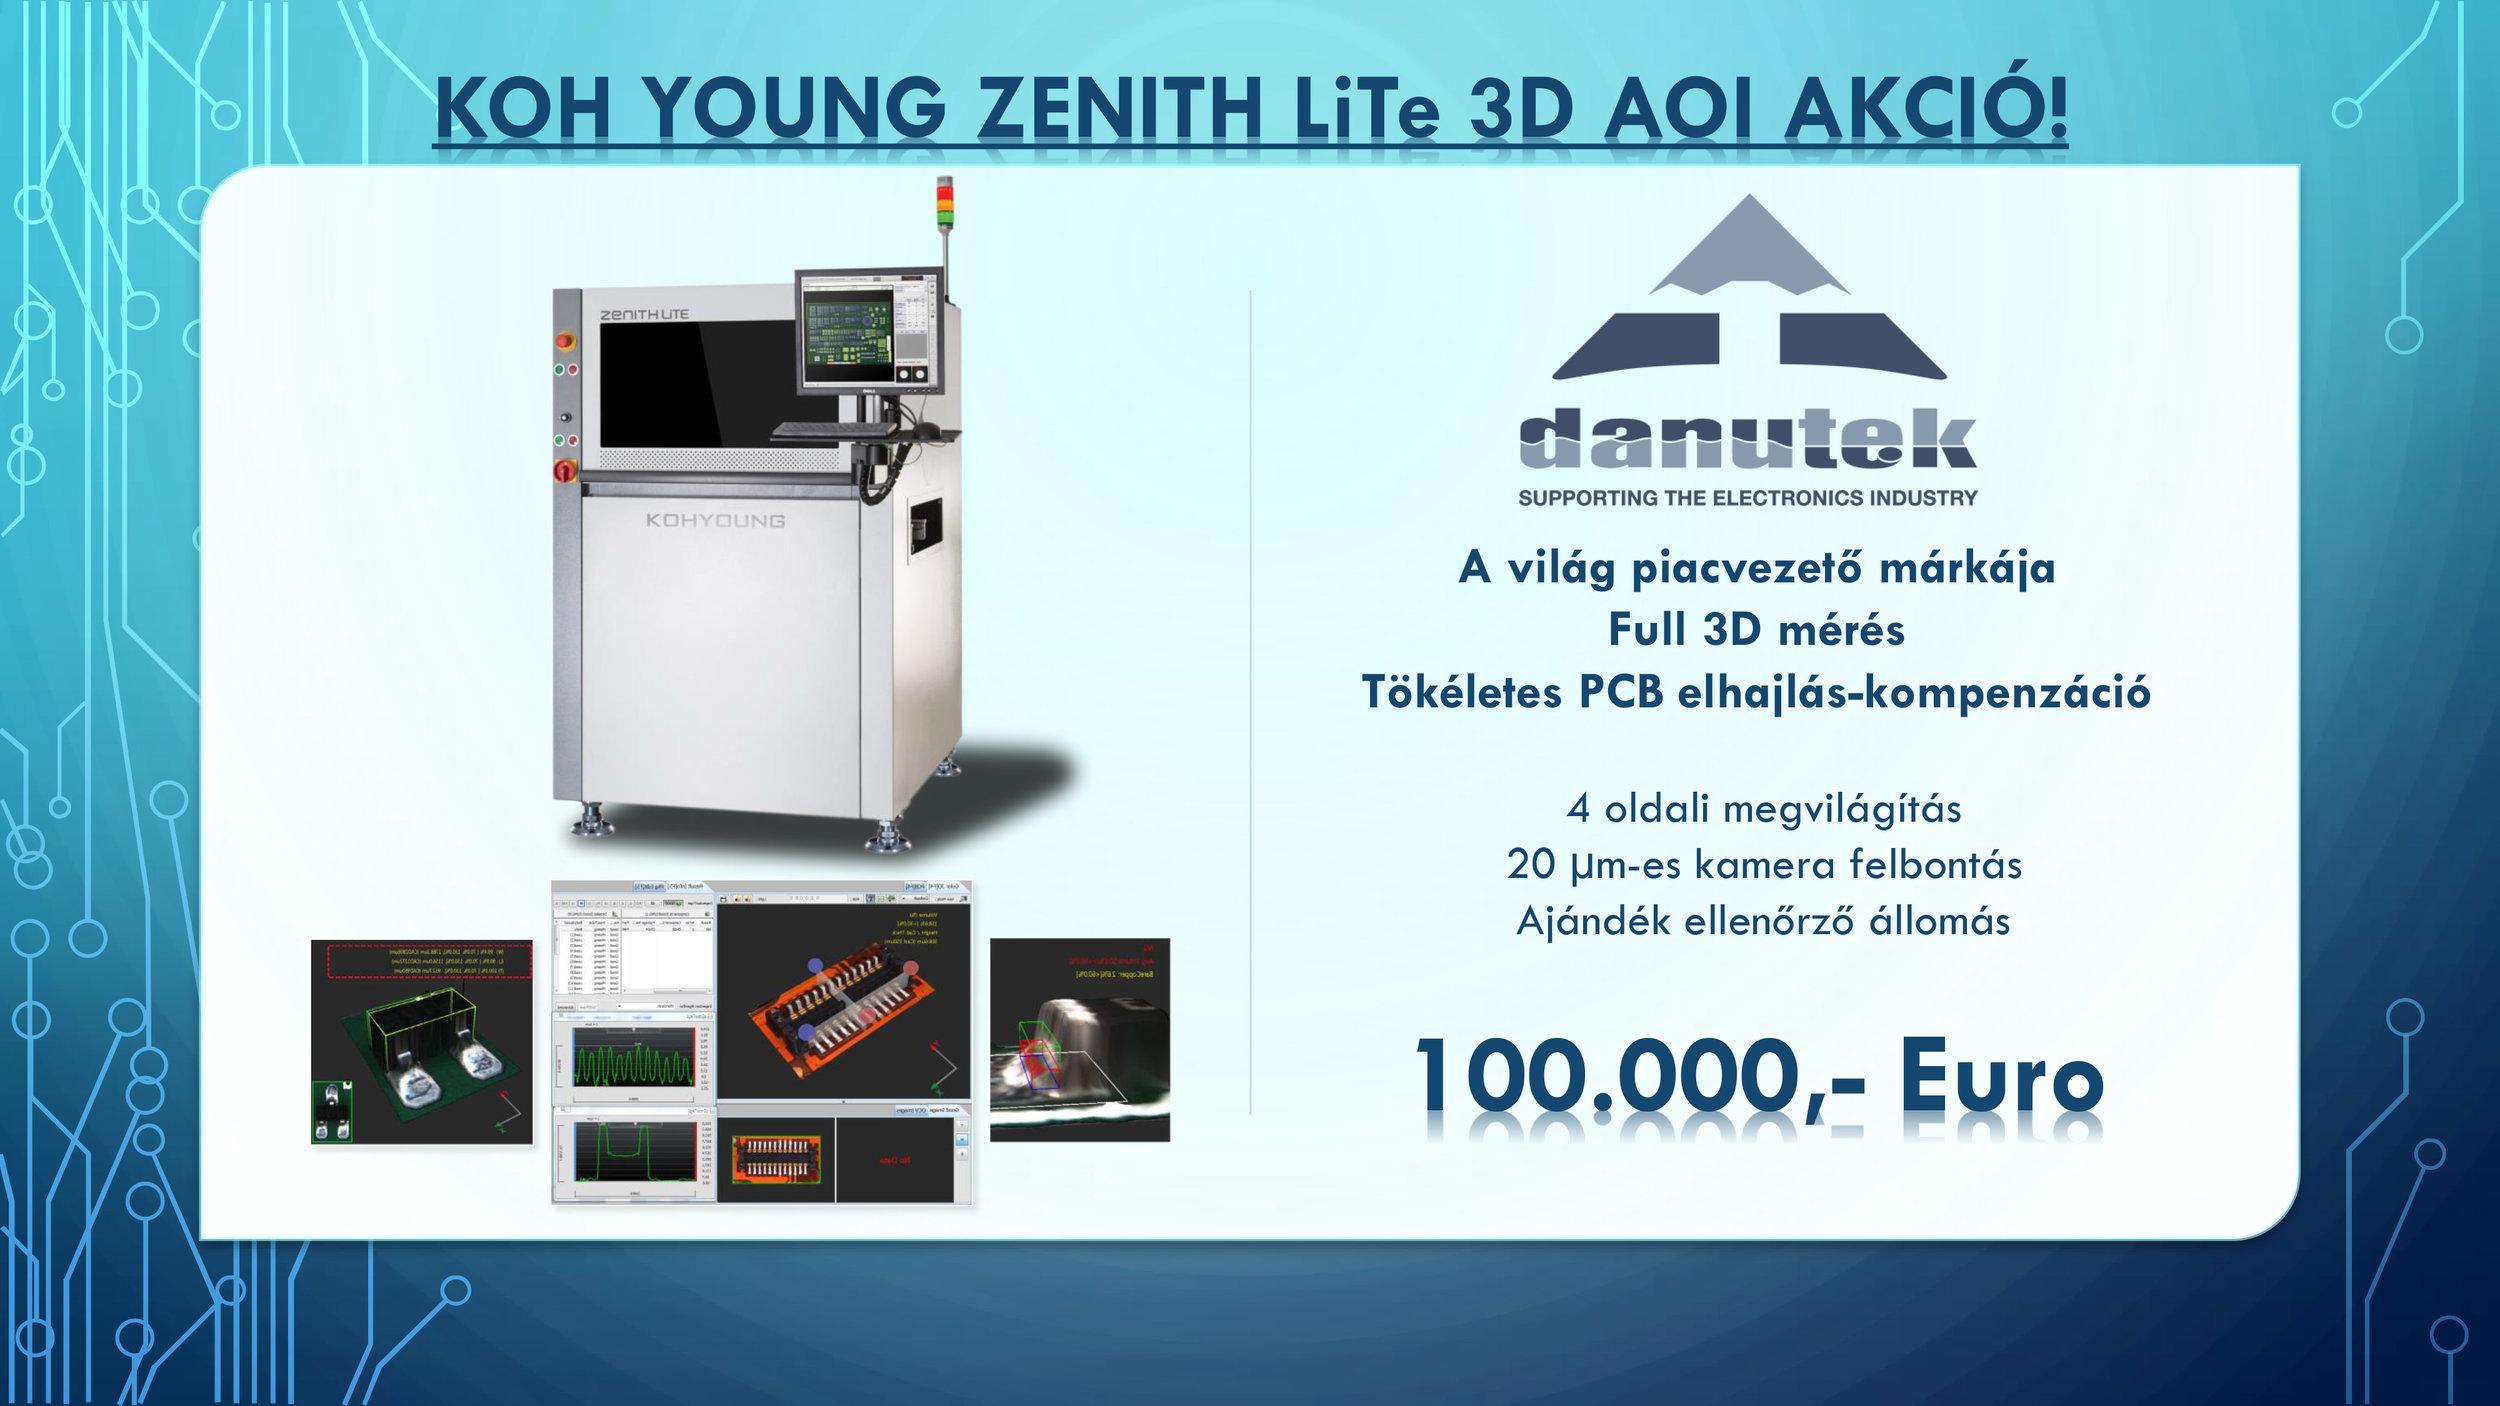 Zenith LiTe 3D AOI Akció.jpg